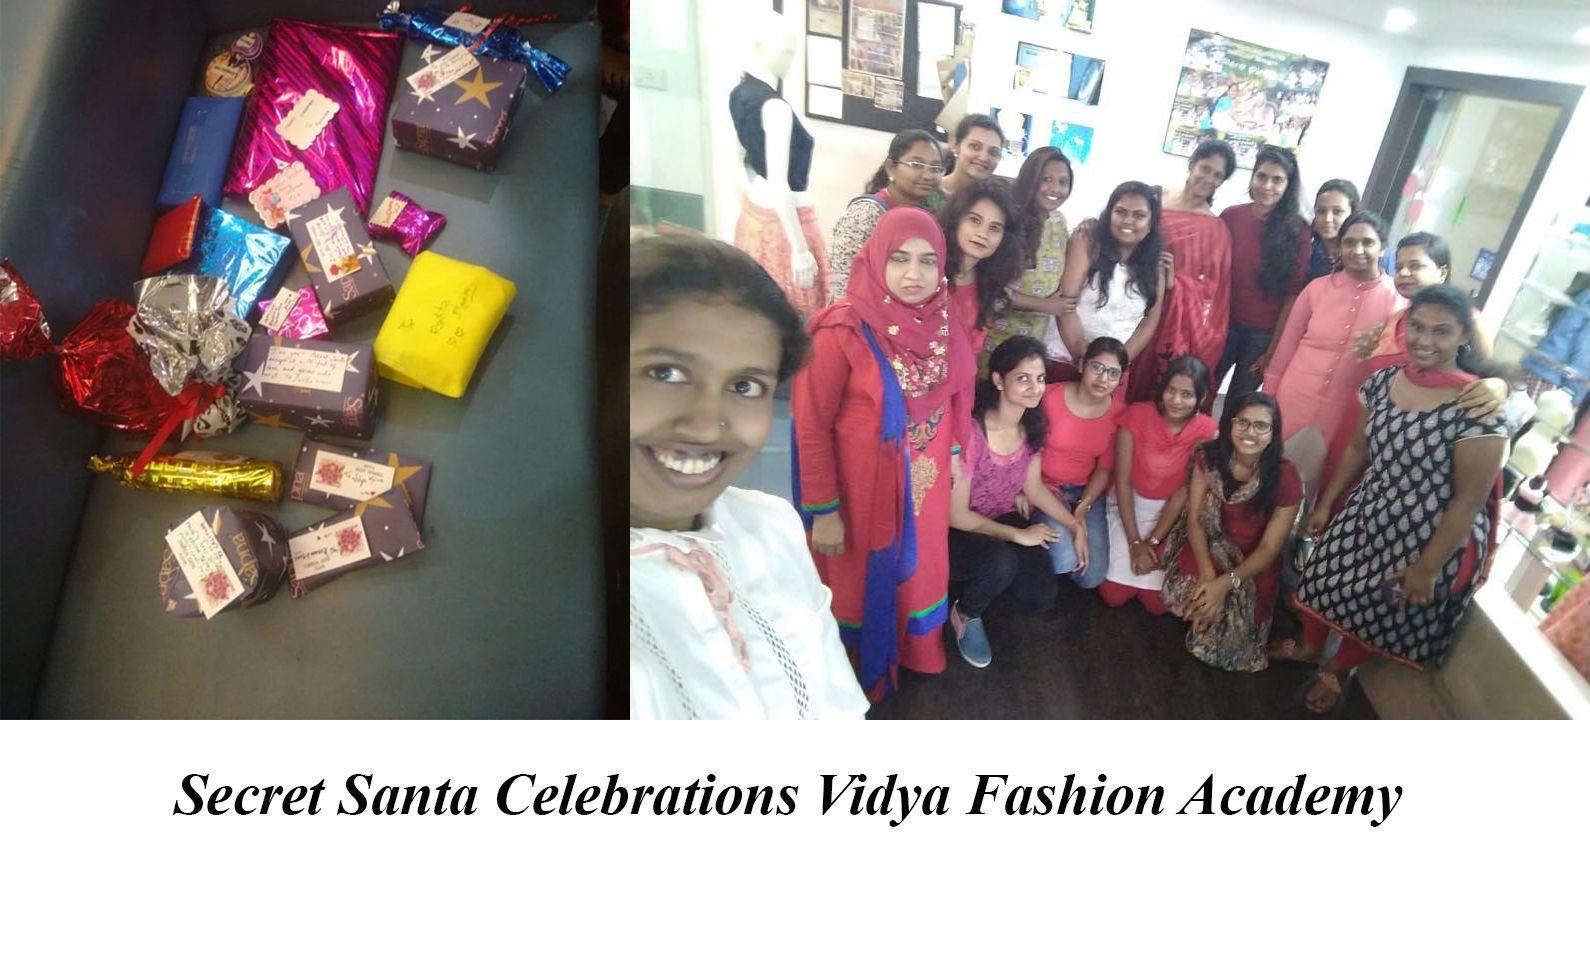 Santa Celebration At One Of The Best Fashion Designing Institute In Bangalore Fashion Designing Institute Celebrities Fashion